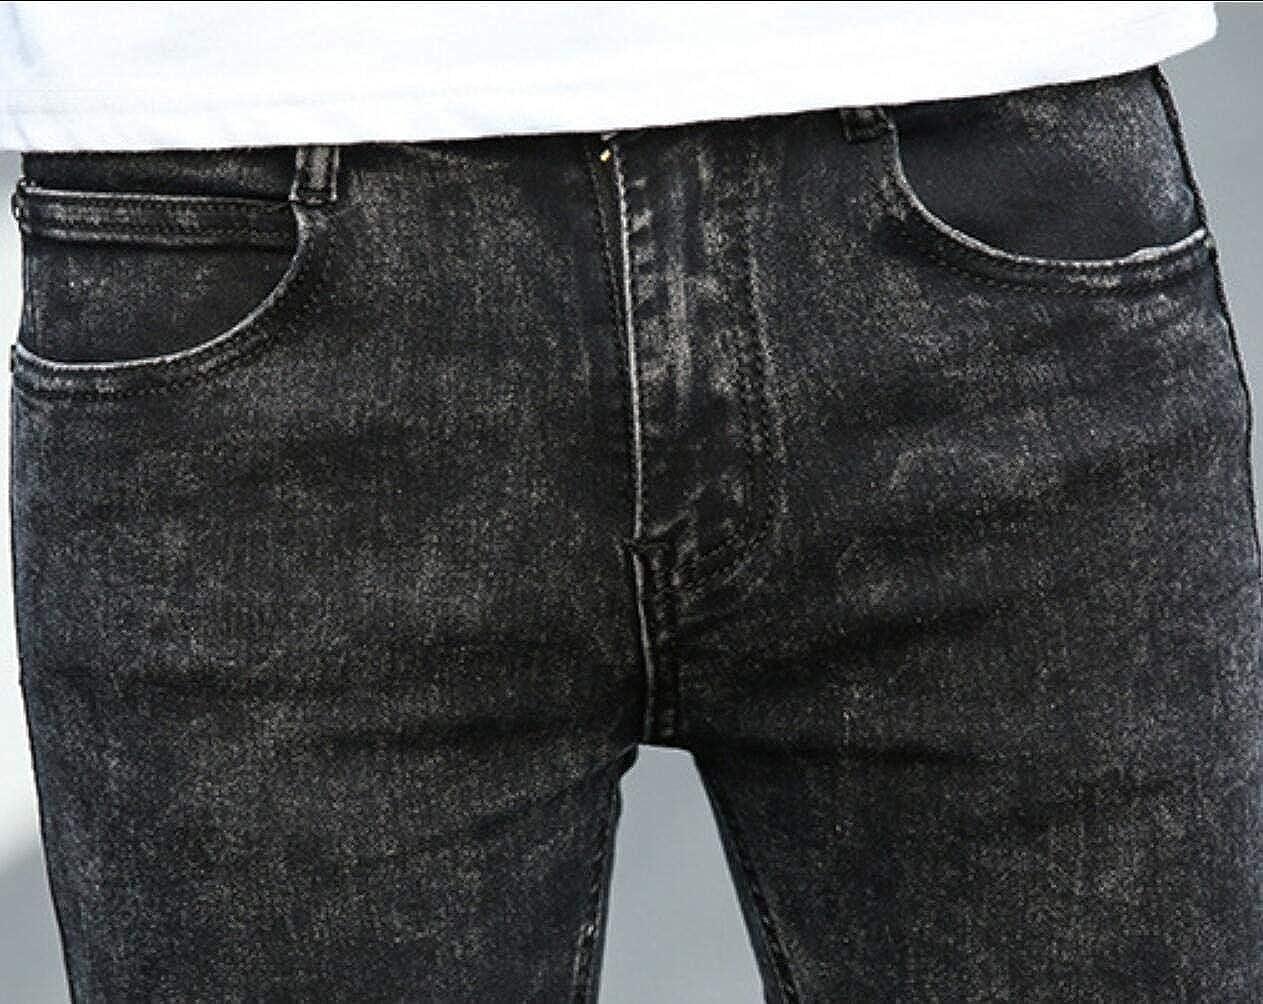 HEFASDM Mens Stretchy Summer Casual Work Pocket Long Slim Denim Jeans